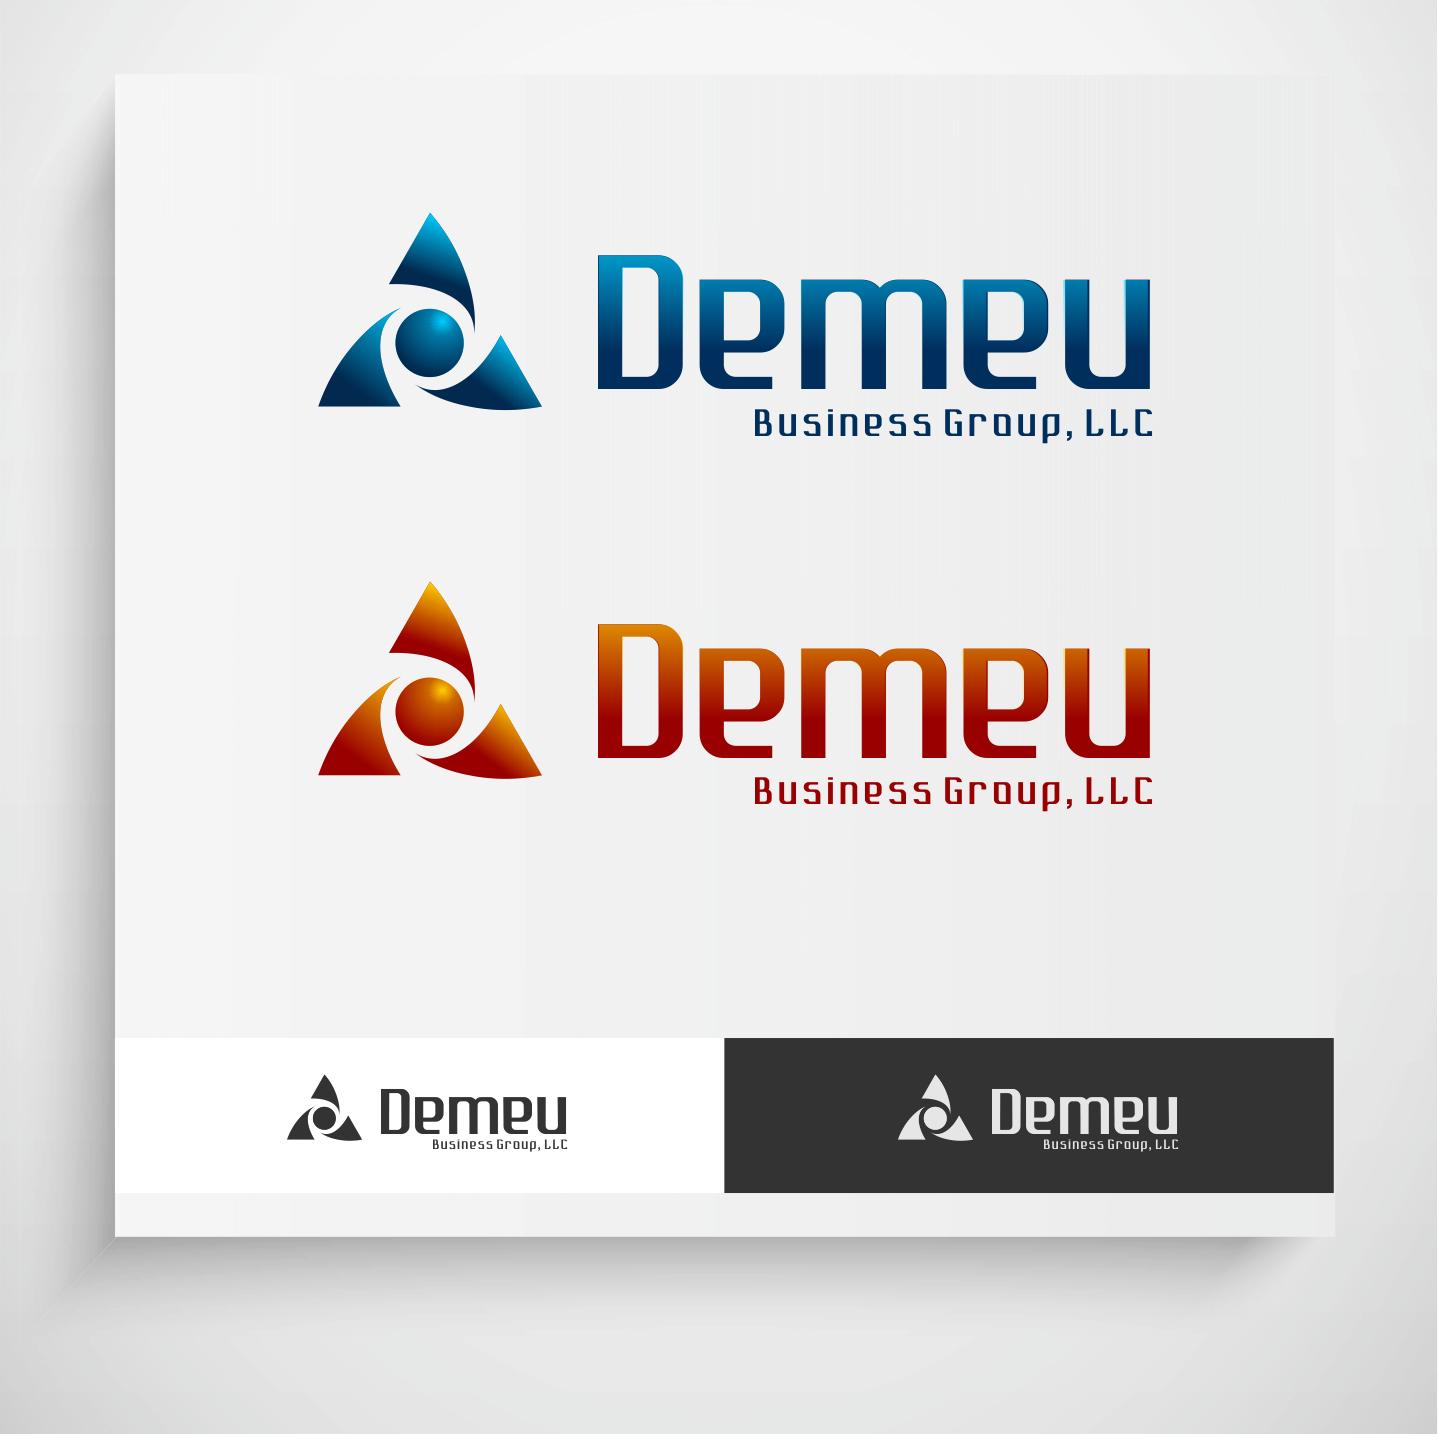 Logo Design by Krzysztof Mokanek - Entry No. 72 in the Logo Design Contest Captivating Logo Design for DEMEU Business Group.